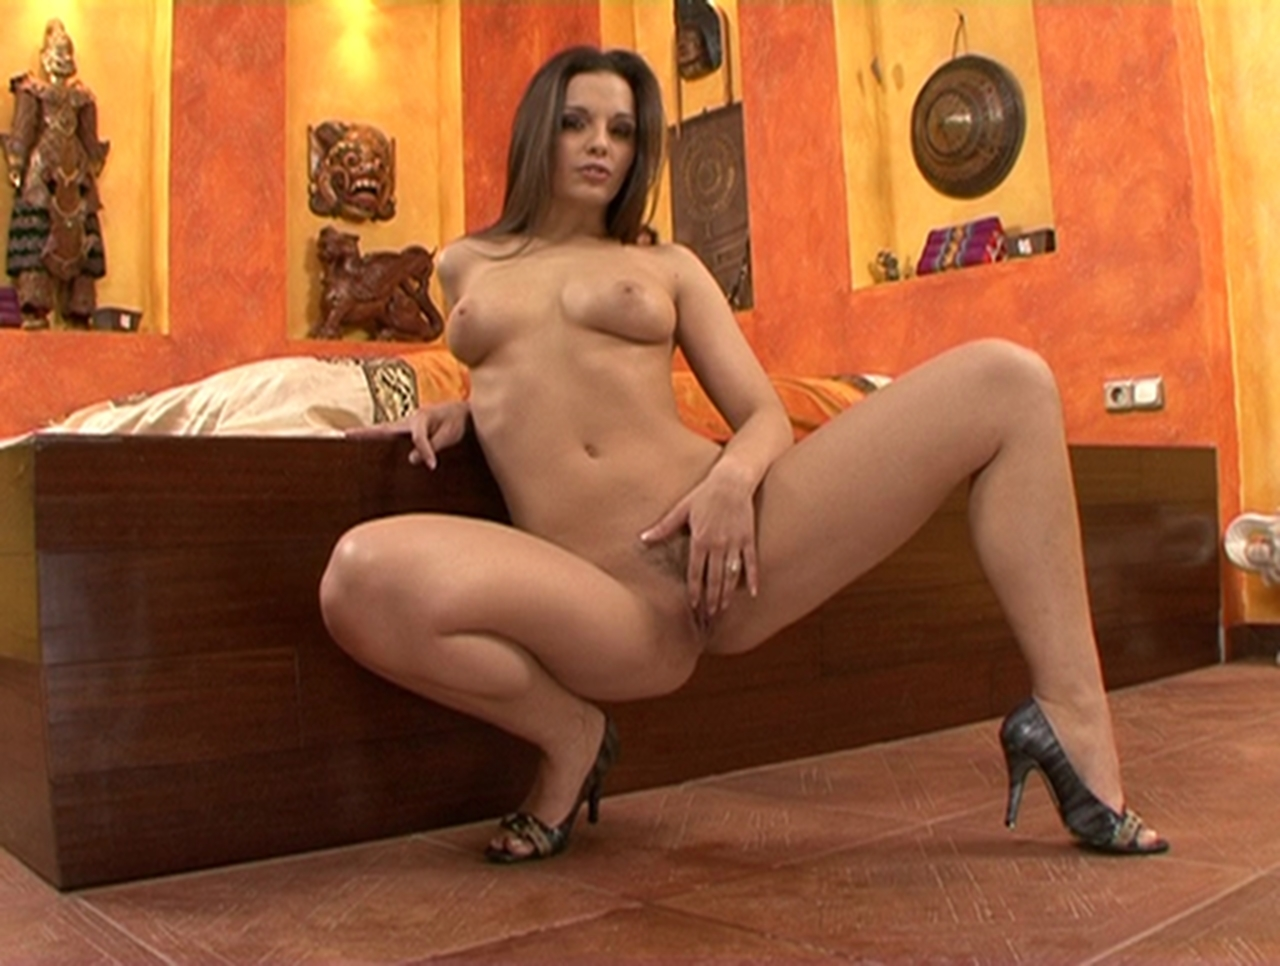 Sexy and rihanna nude